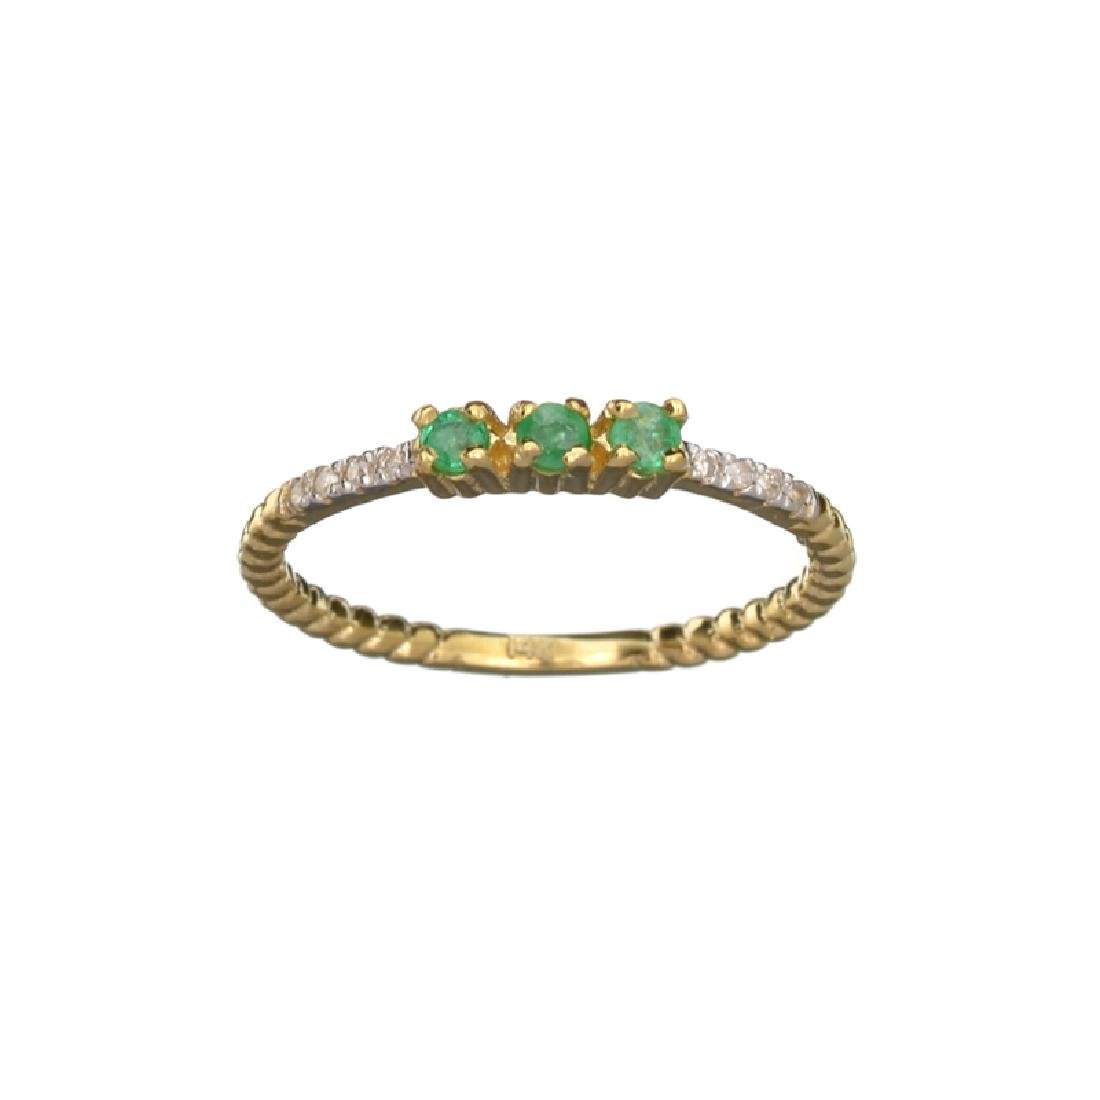 APP: 0.6k Fine Jewelry 14KT Gold, 0.18CT Green Emerald